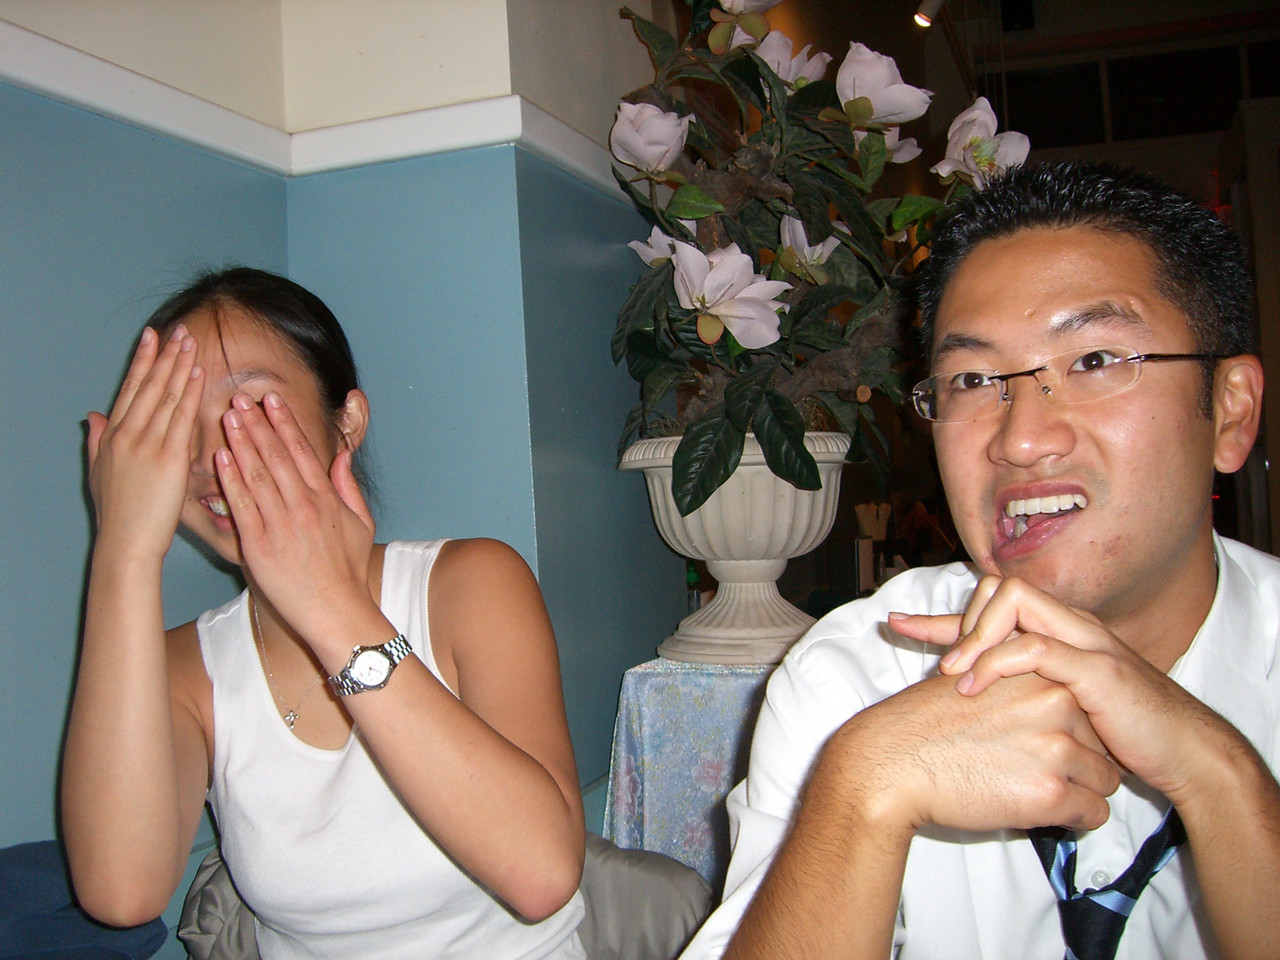 2005 10 22 Sat - Jenny Alyono ashamed of Bryan Lung